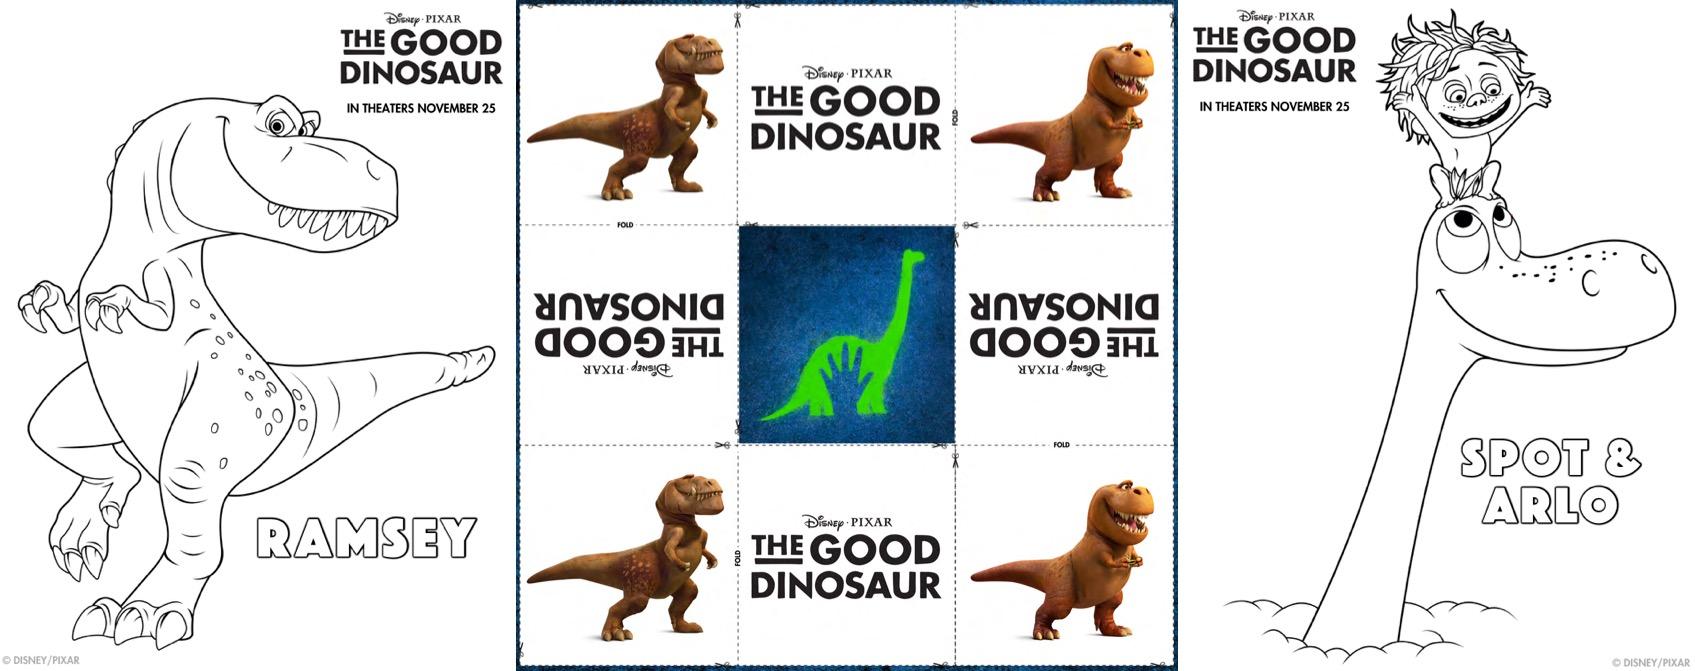 Pixar Post - Good DIno Activity Pages.jpg